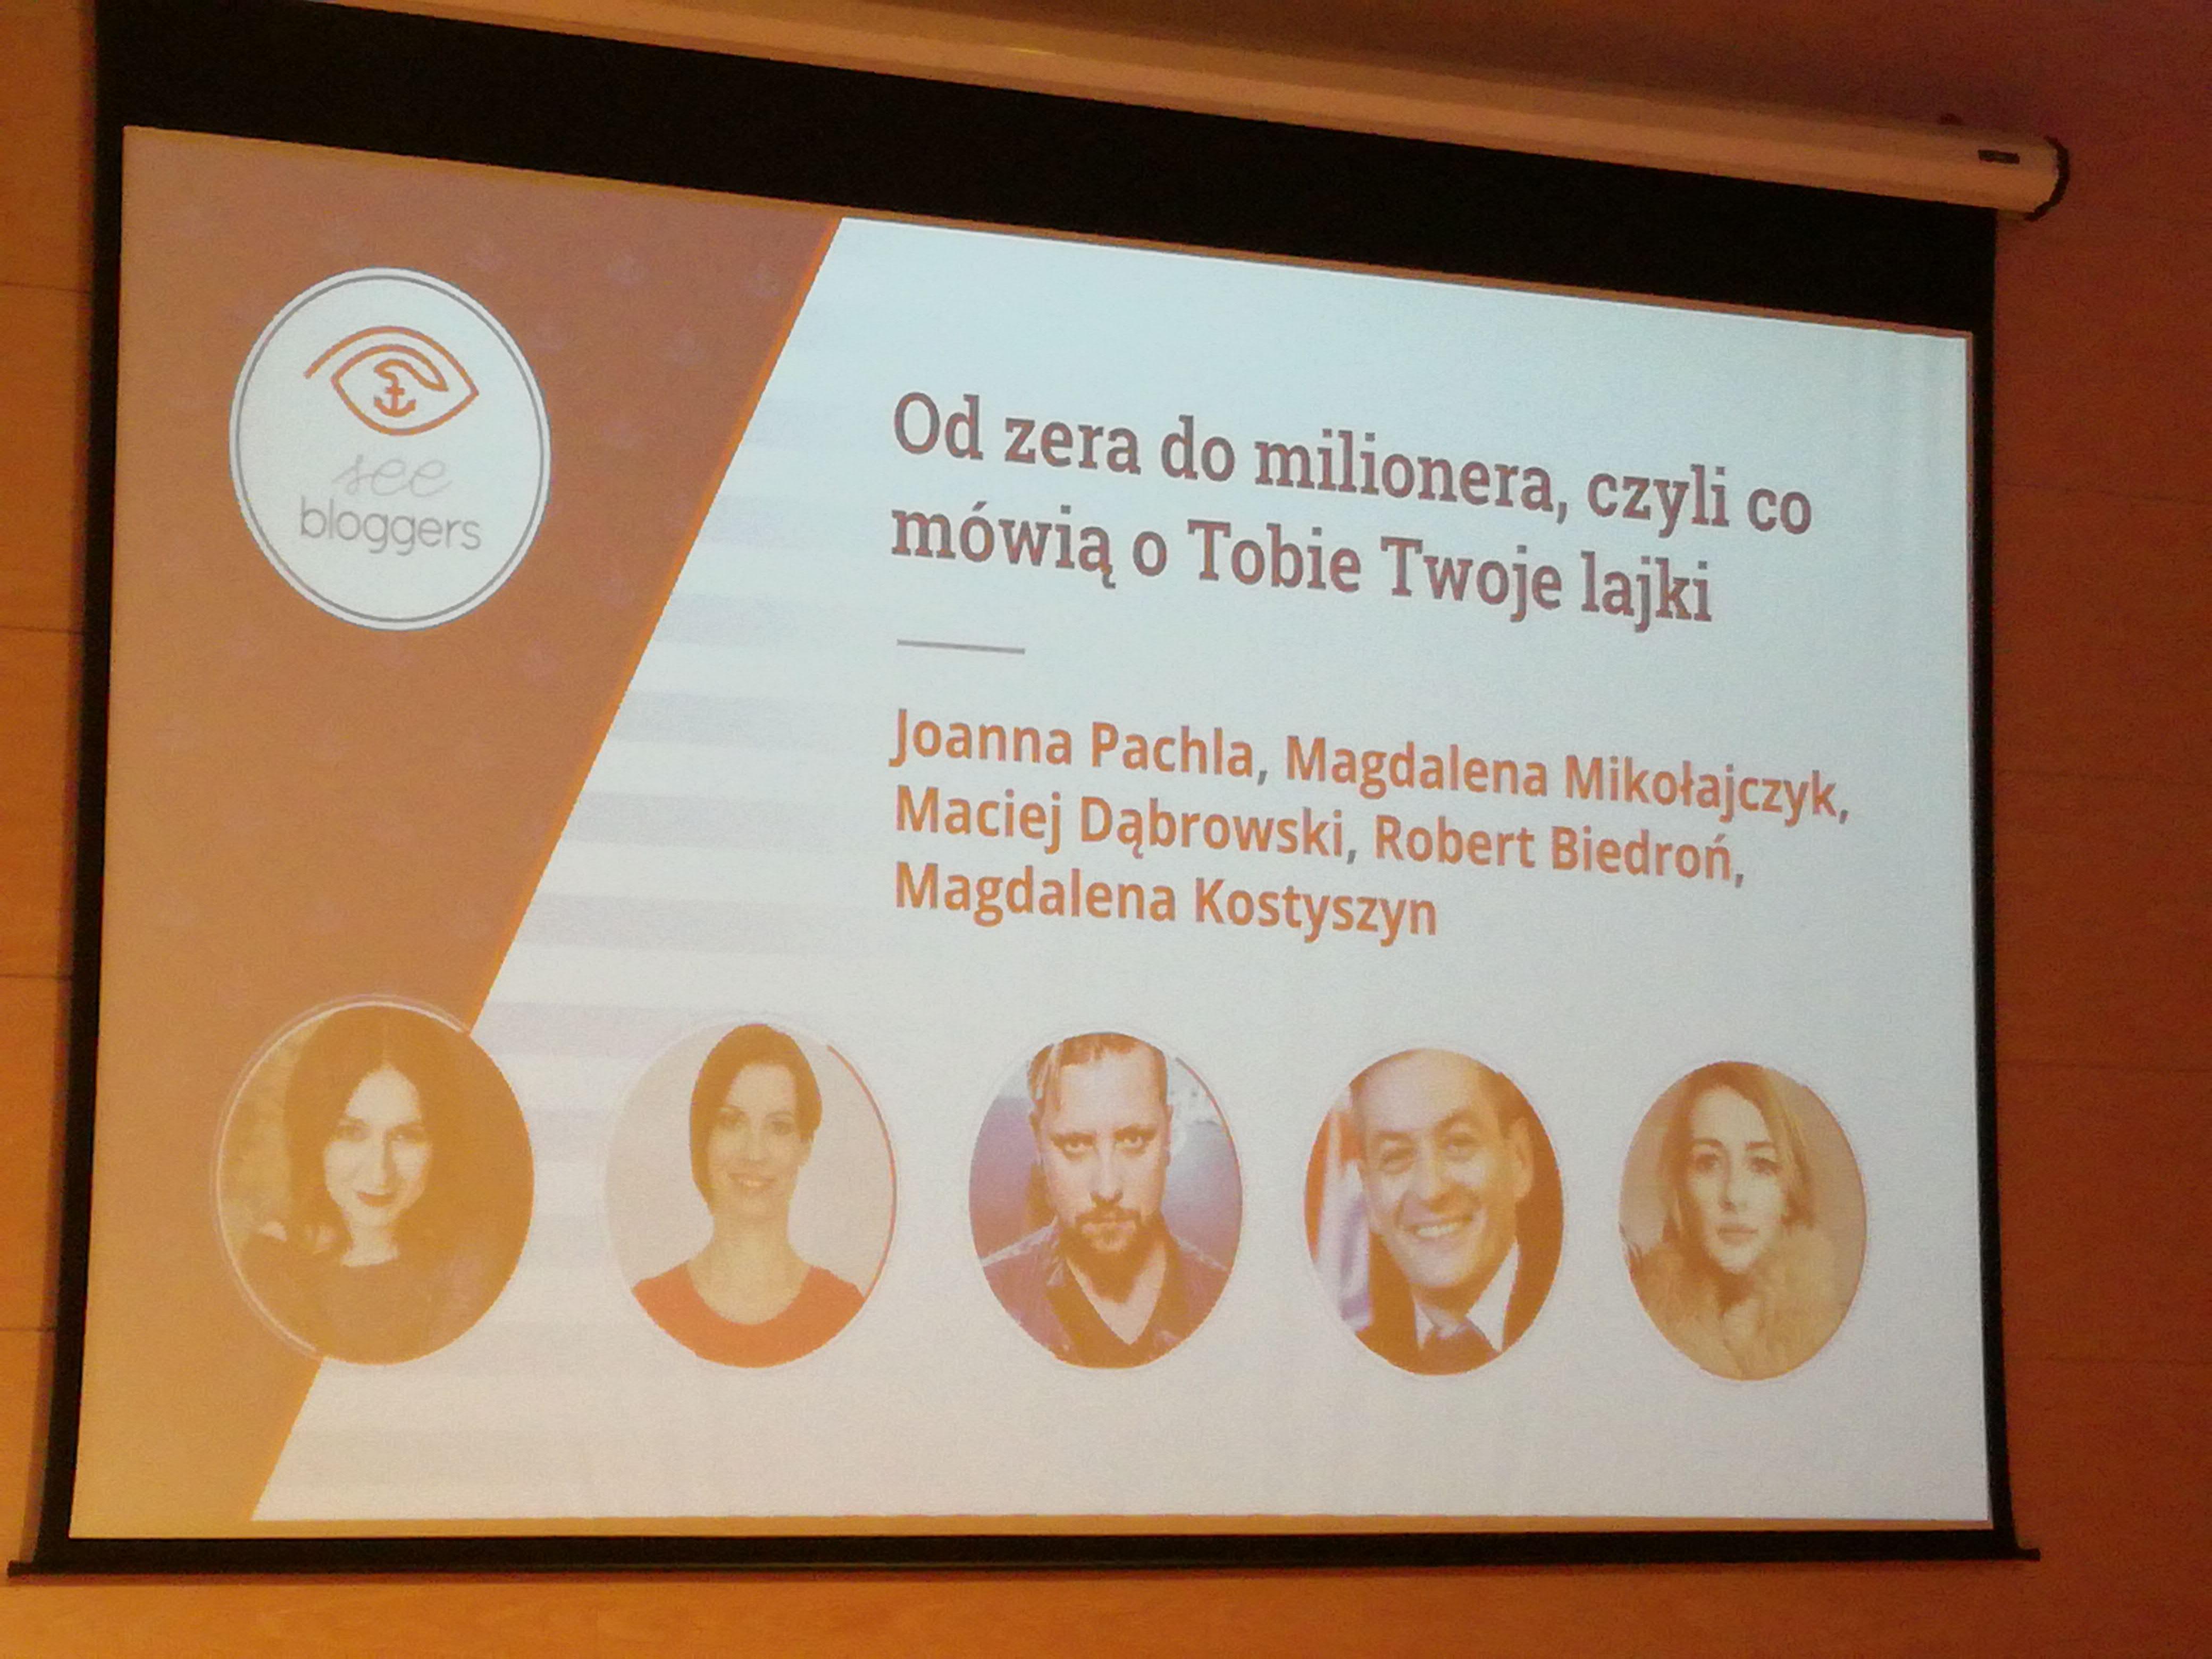 SeeBloggers panel